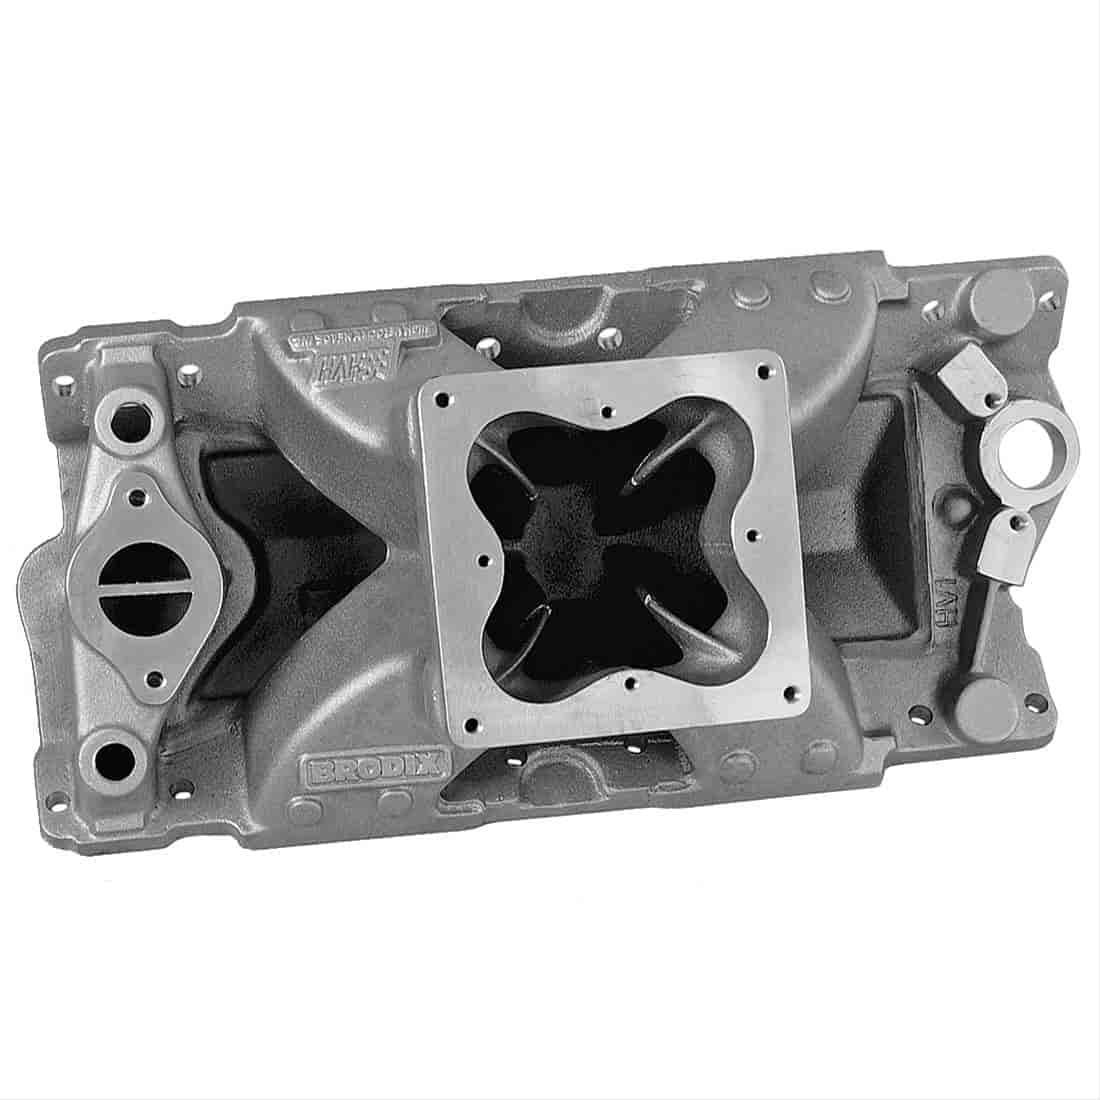 Brodix HV1002 HV 1002 Series Intake Manifold Small Block